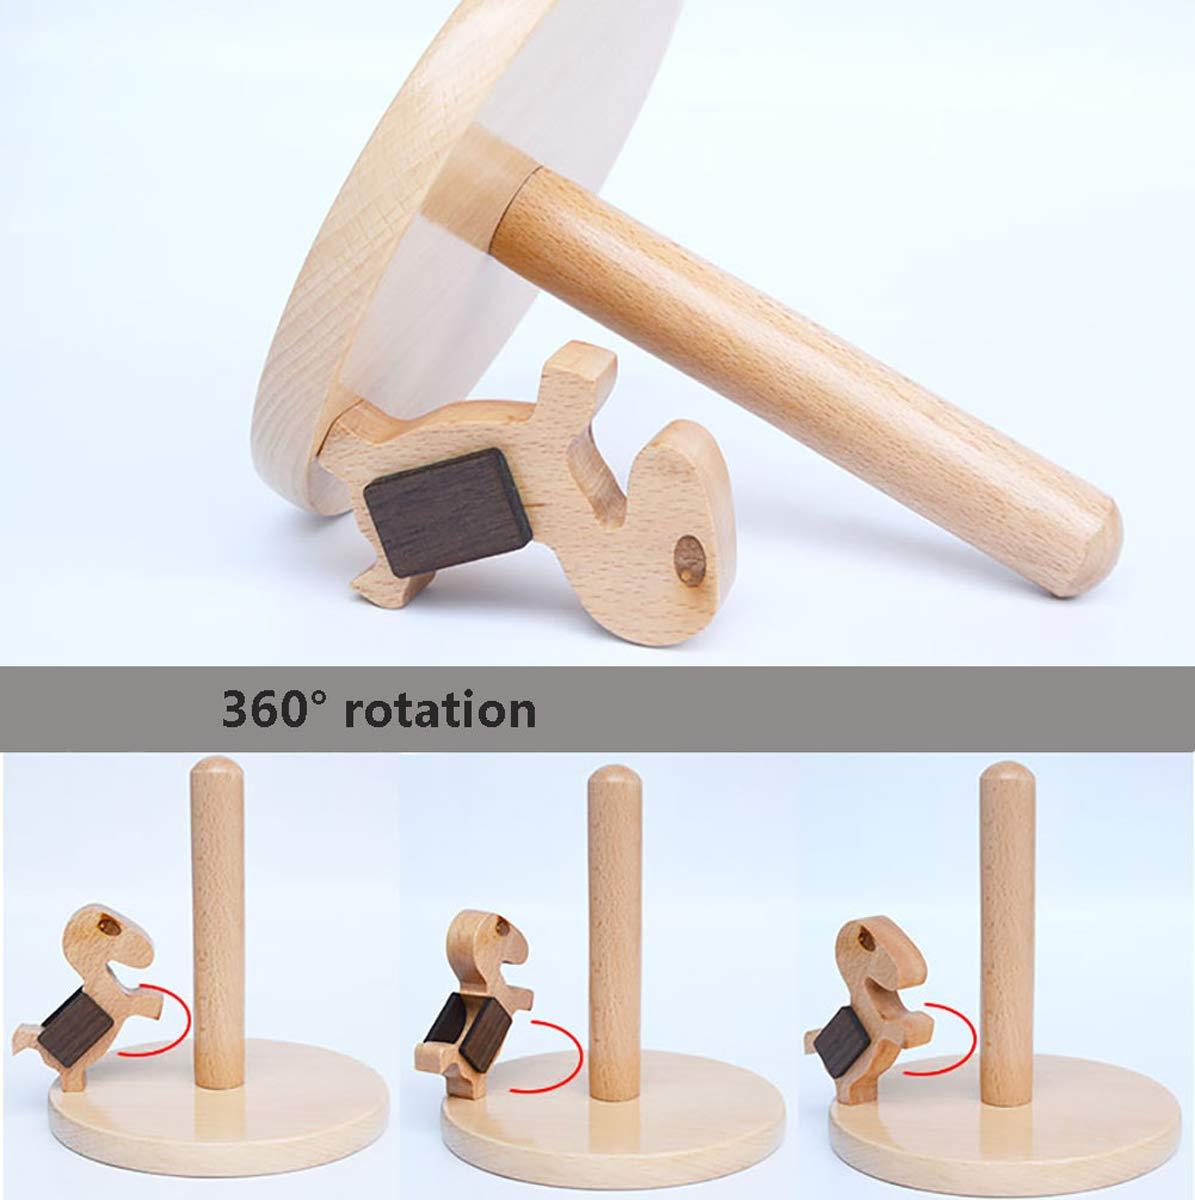 Q&F Toilet Paper Holder Home Solid Wooden Tissue Holder,Waterproof,Non-slip,Desktop Storage Rack by Q&F (Image #4)